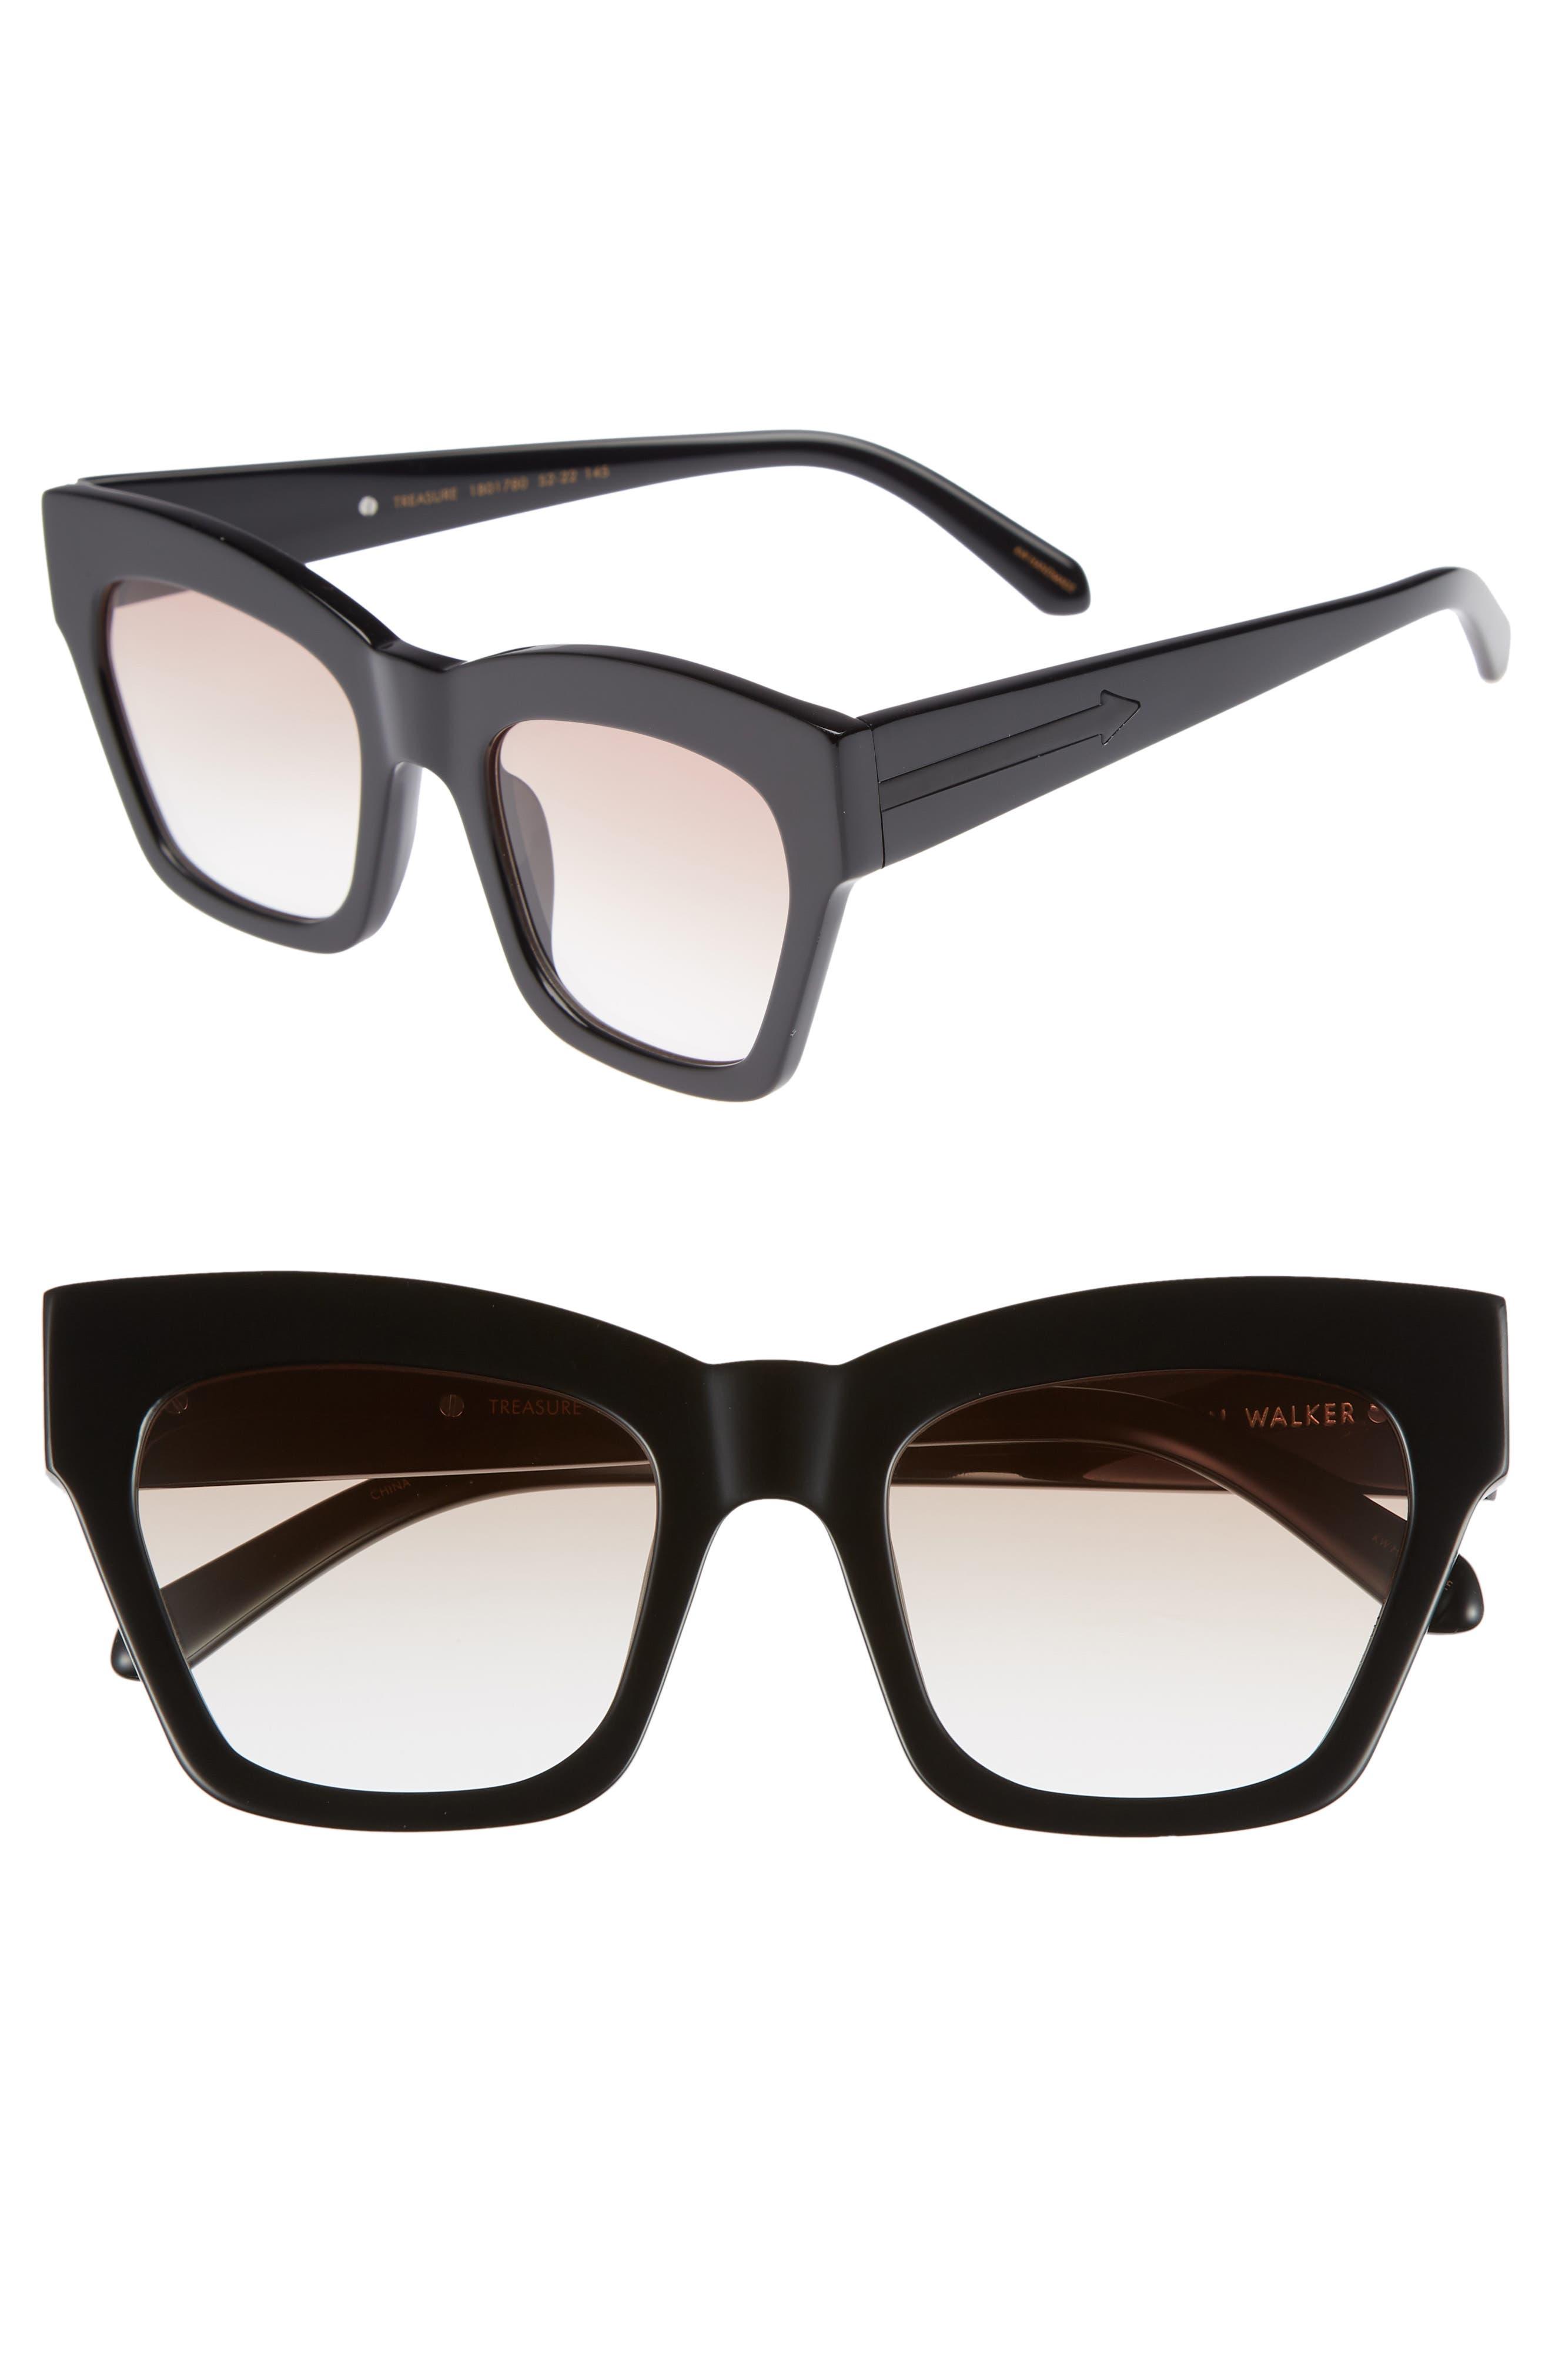 Treasure 52mm Cat Eye Sunglasses,                             Main thumbnail 1, color,                             Shiny Black/ Brown